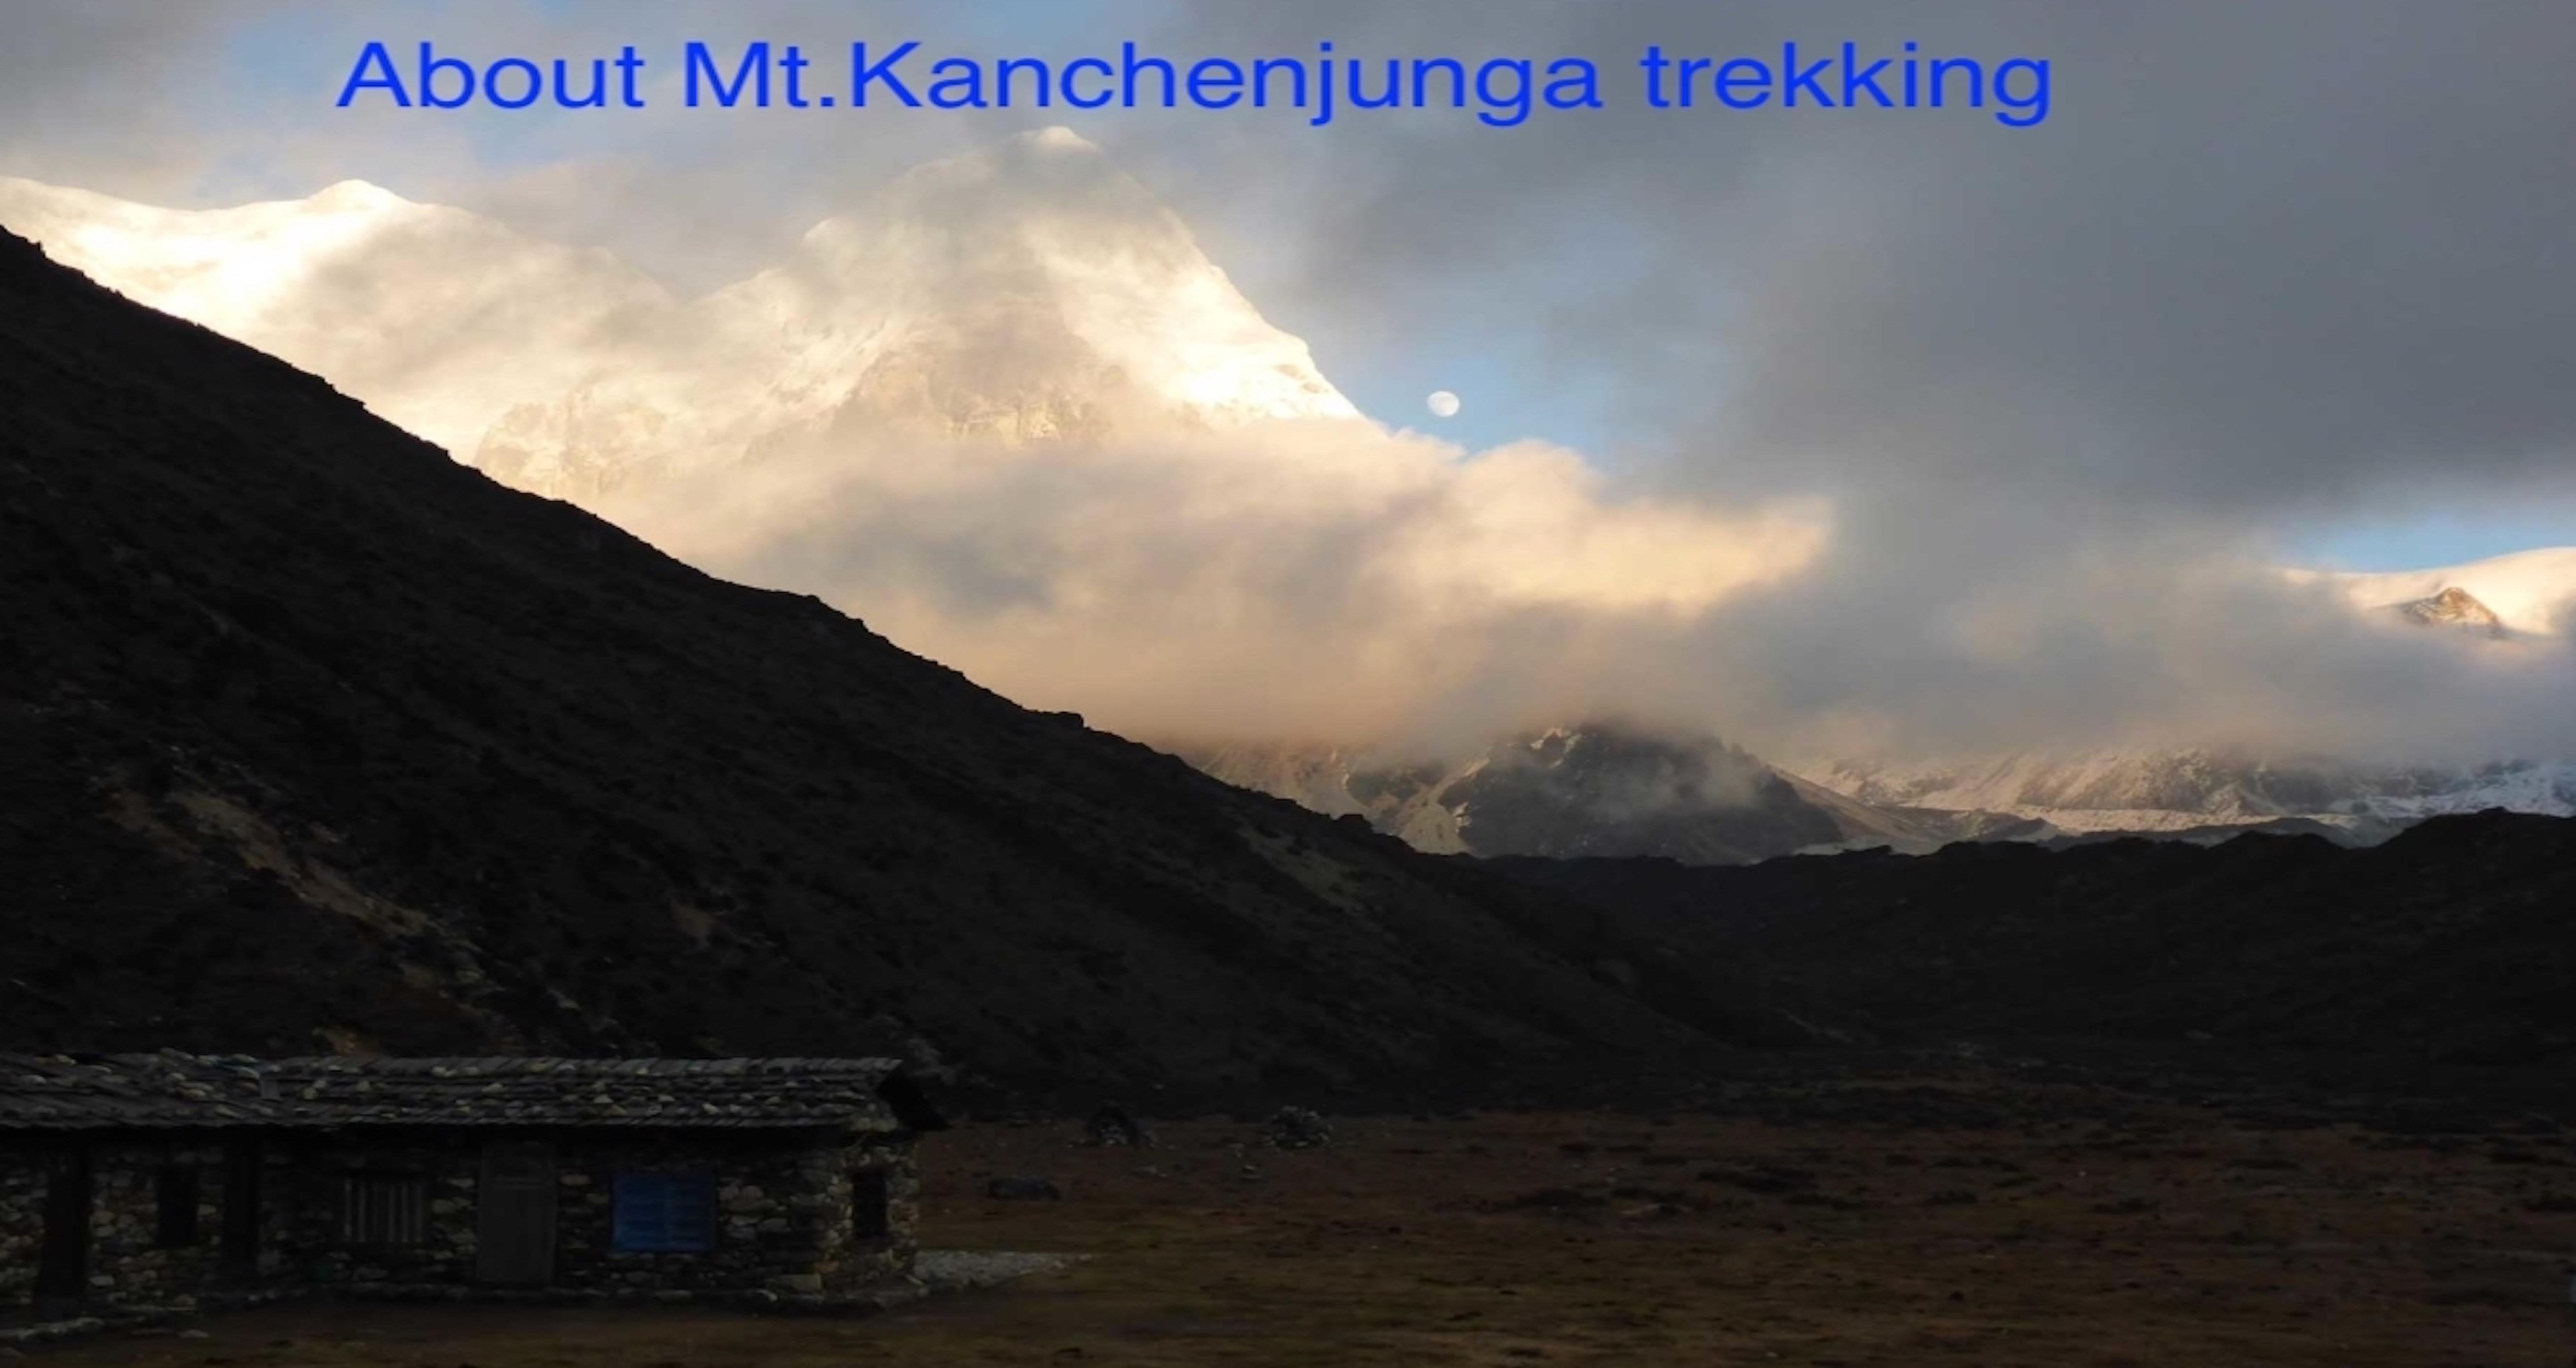 Mt.Kanchenjunga trekkig